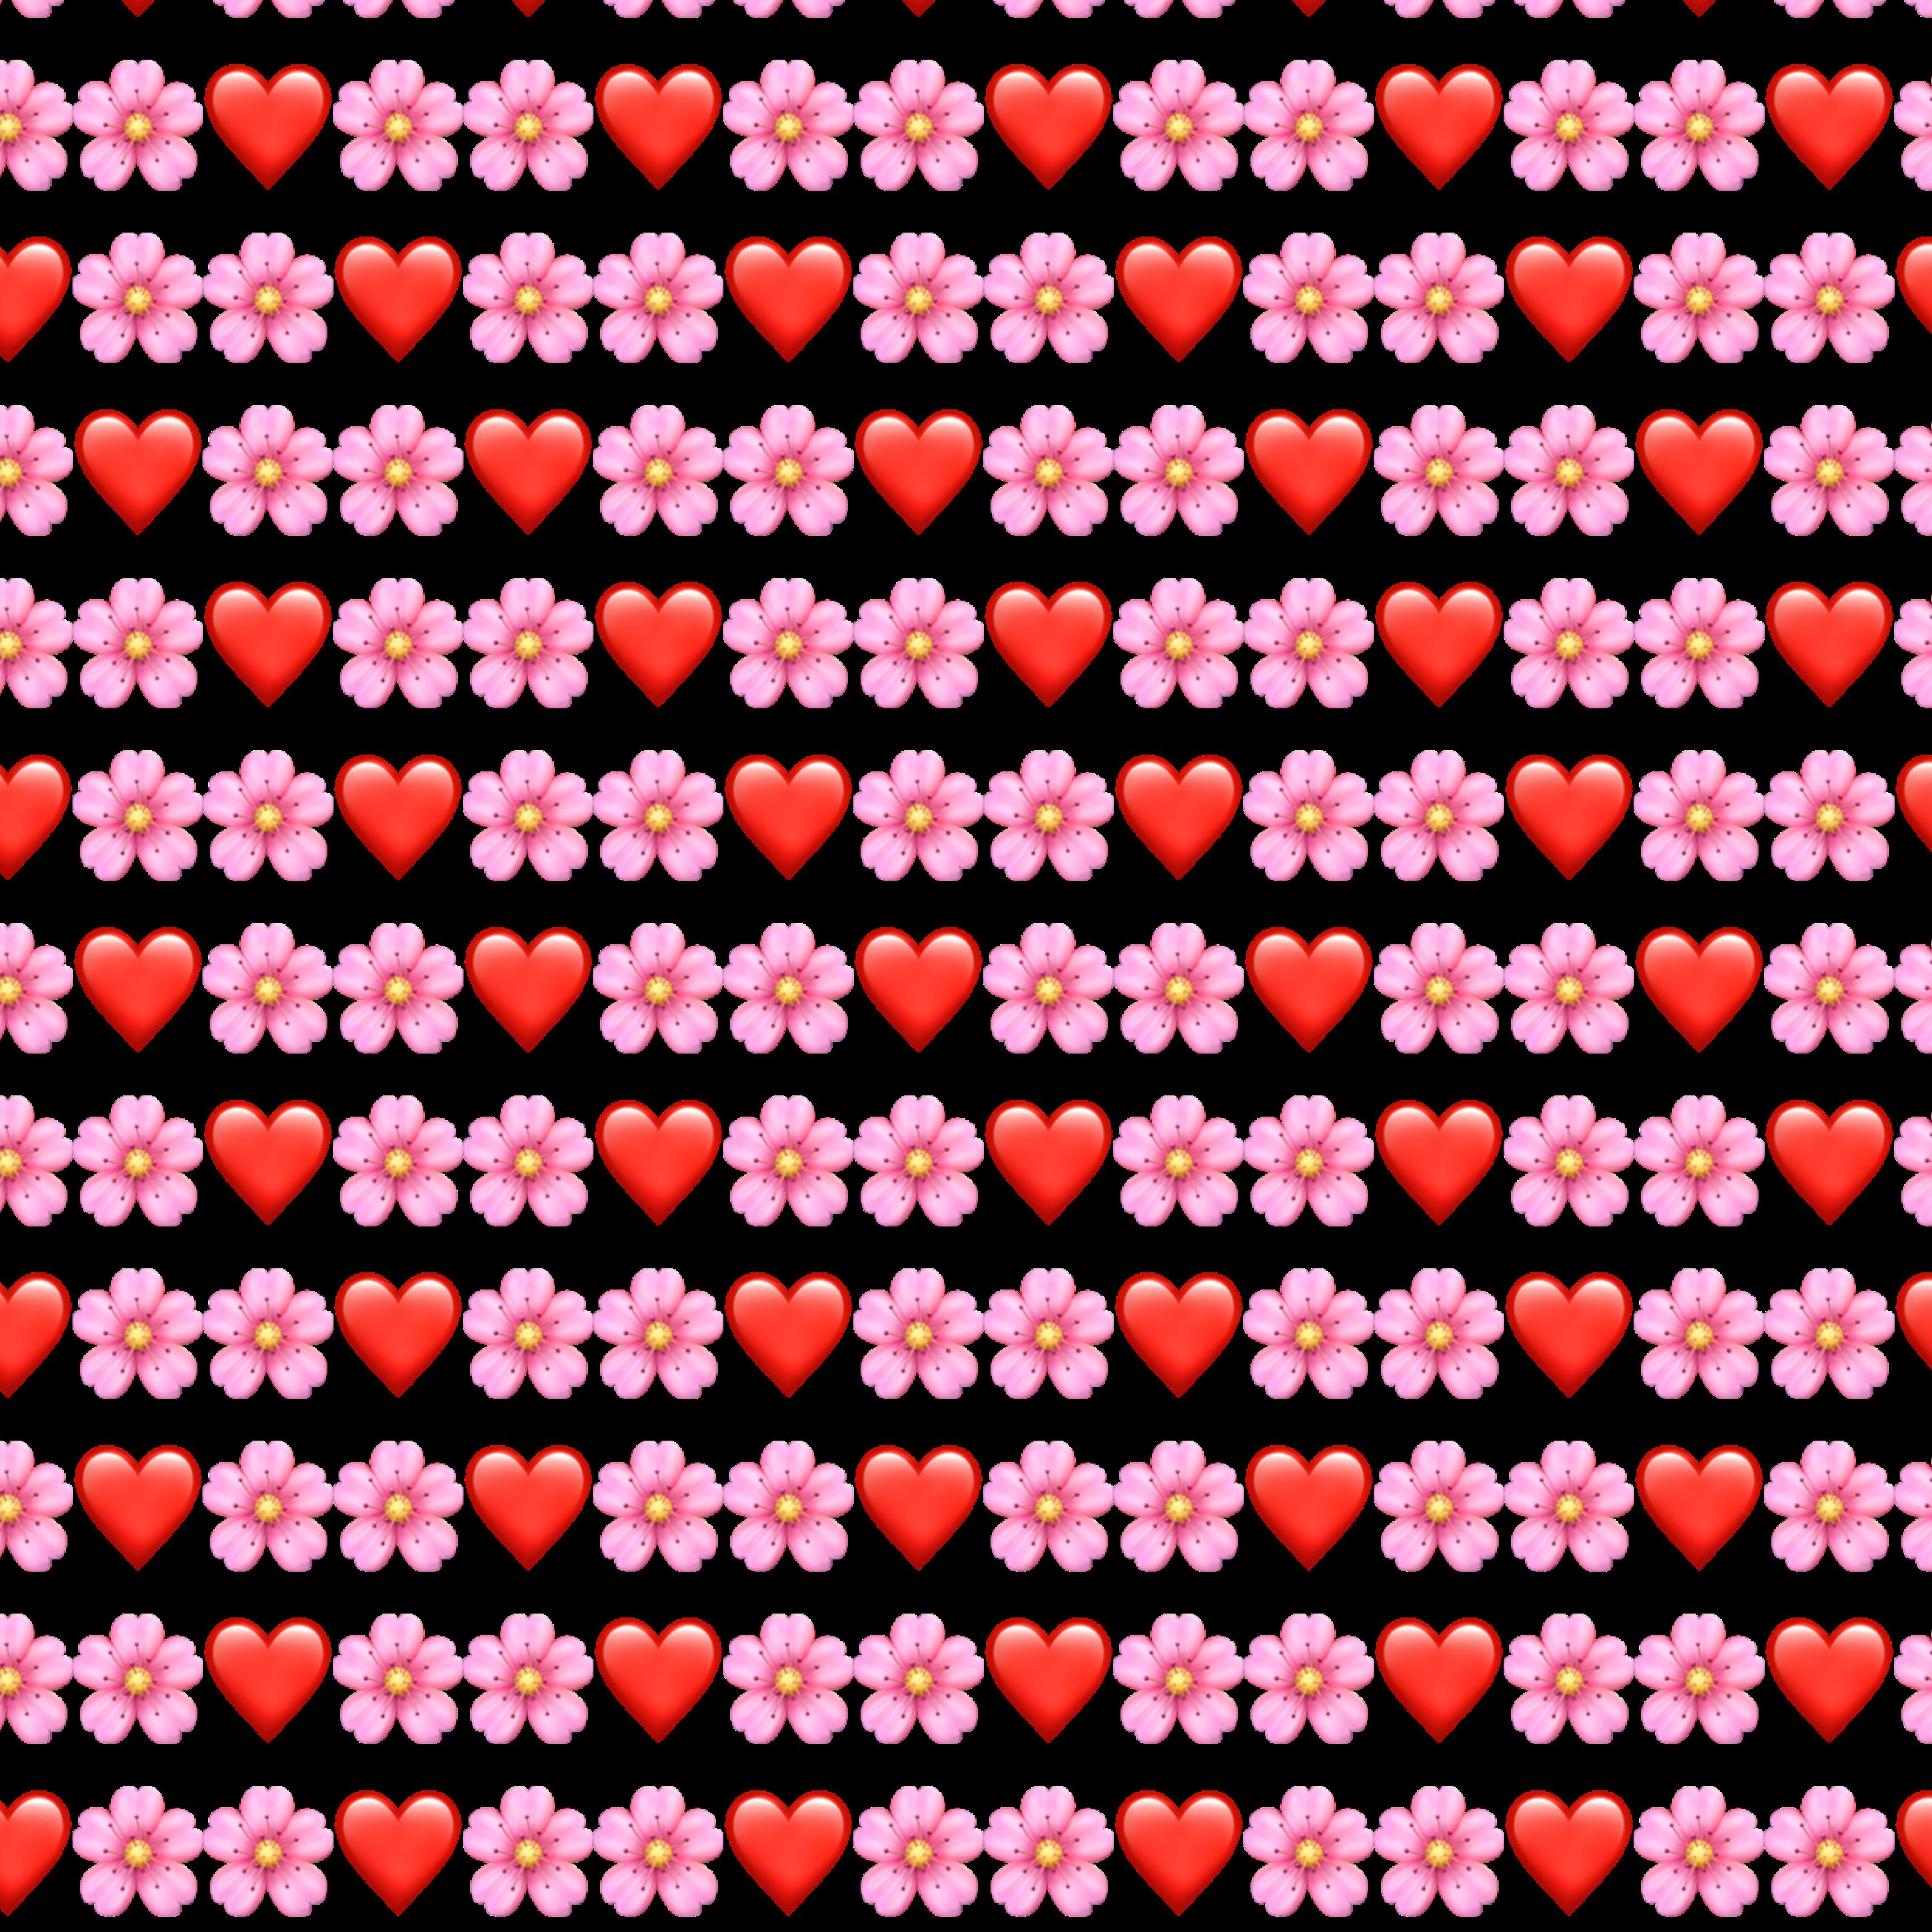 того, картинки где много сердечек луркоморье